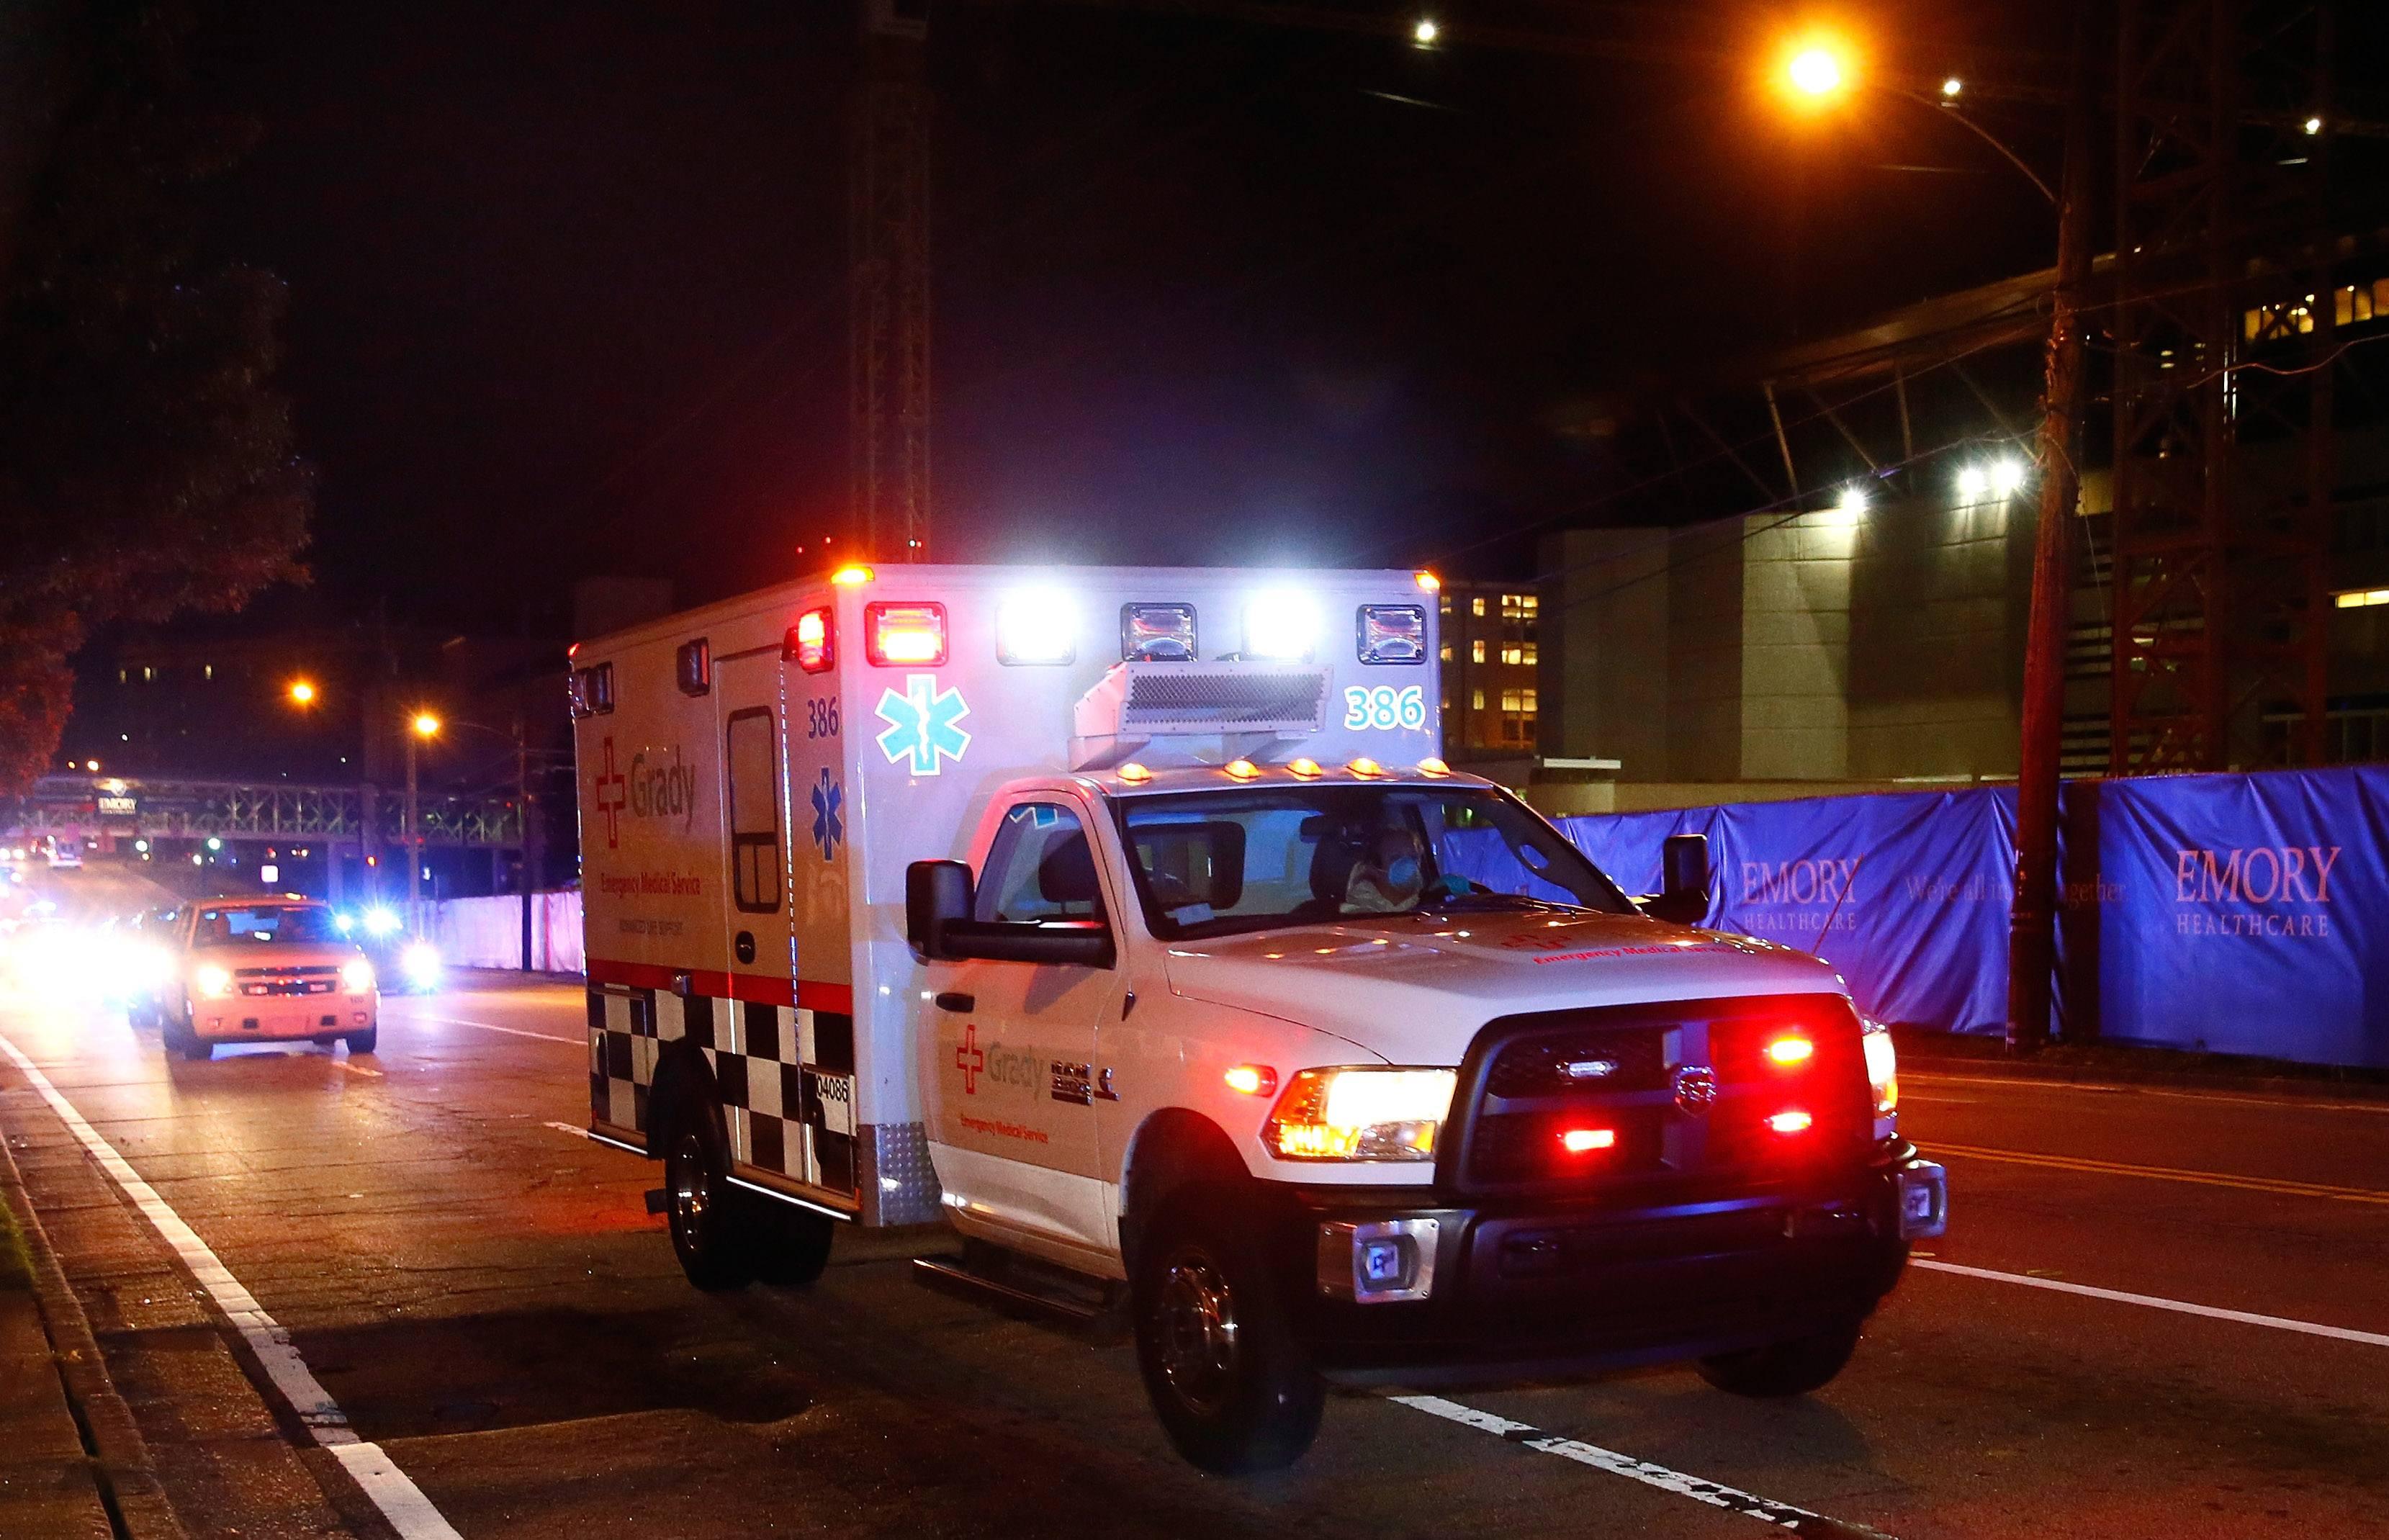 An ambulance on an Atlanta street